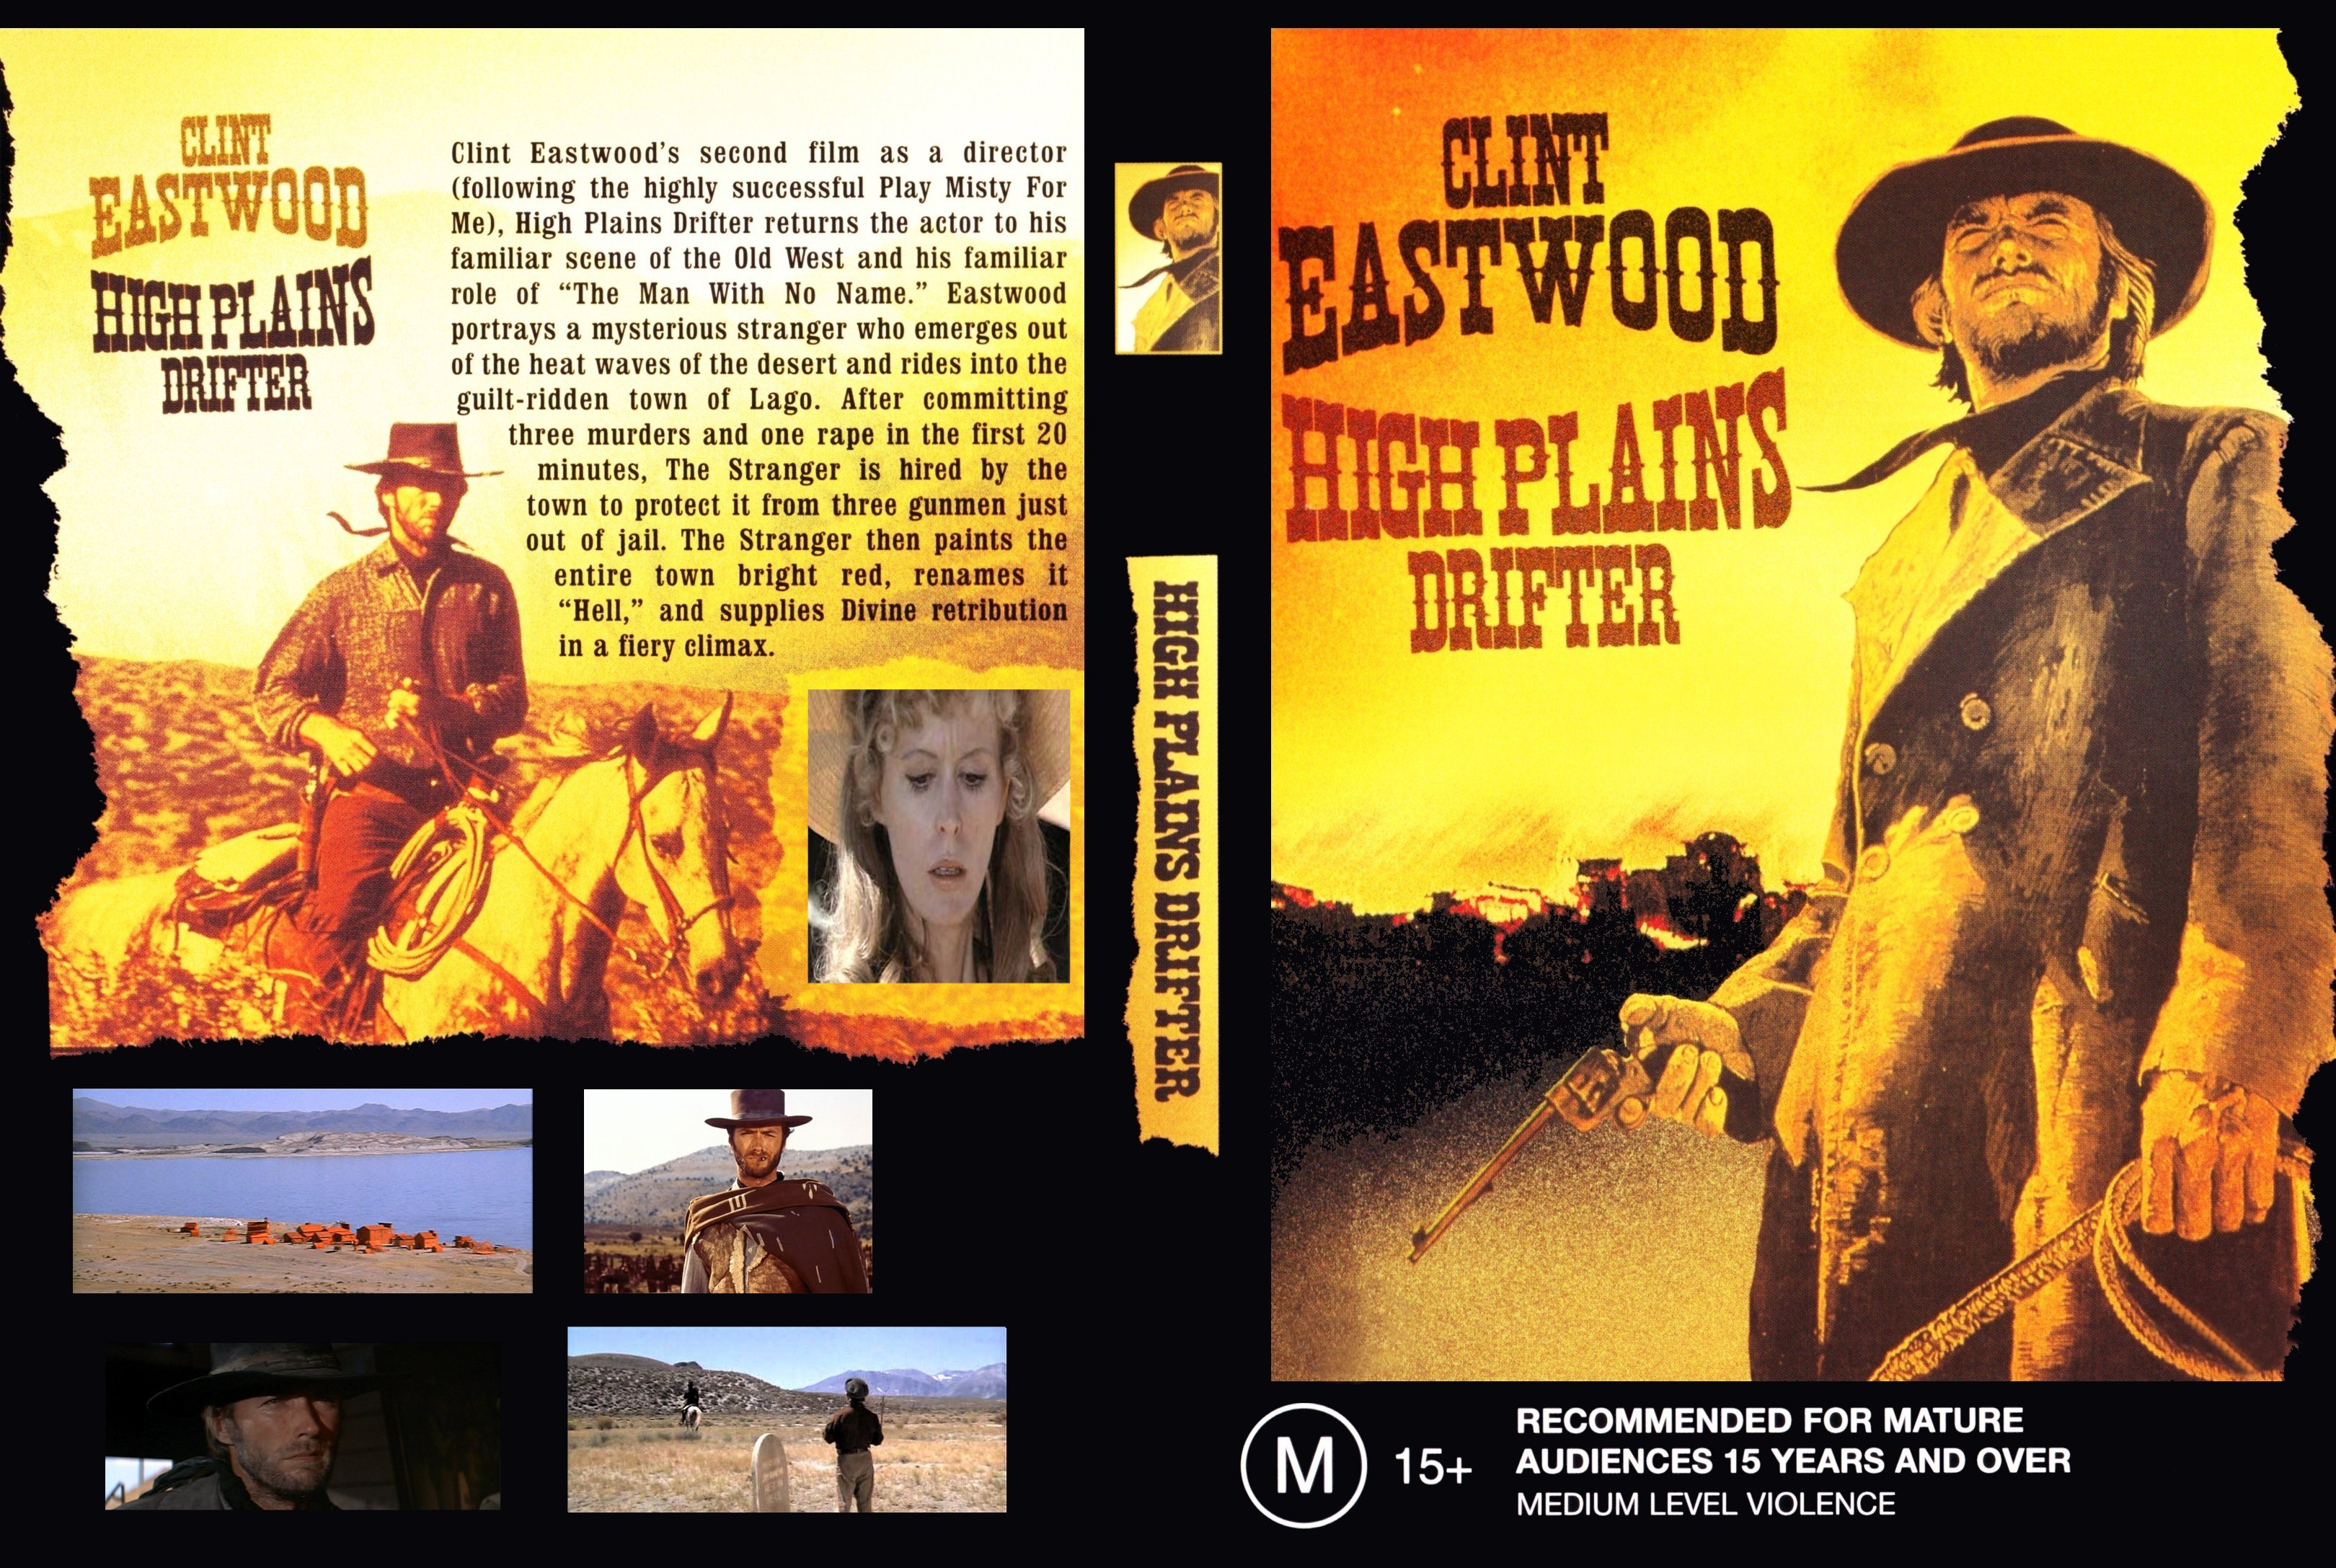 high plains drifter (1973) full movie